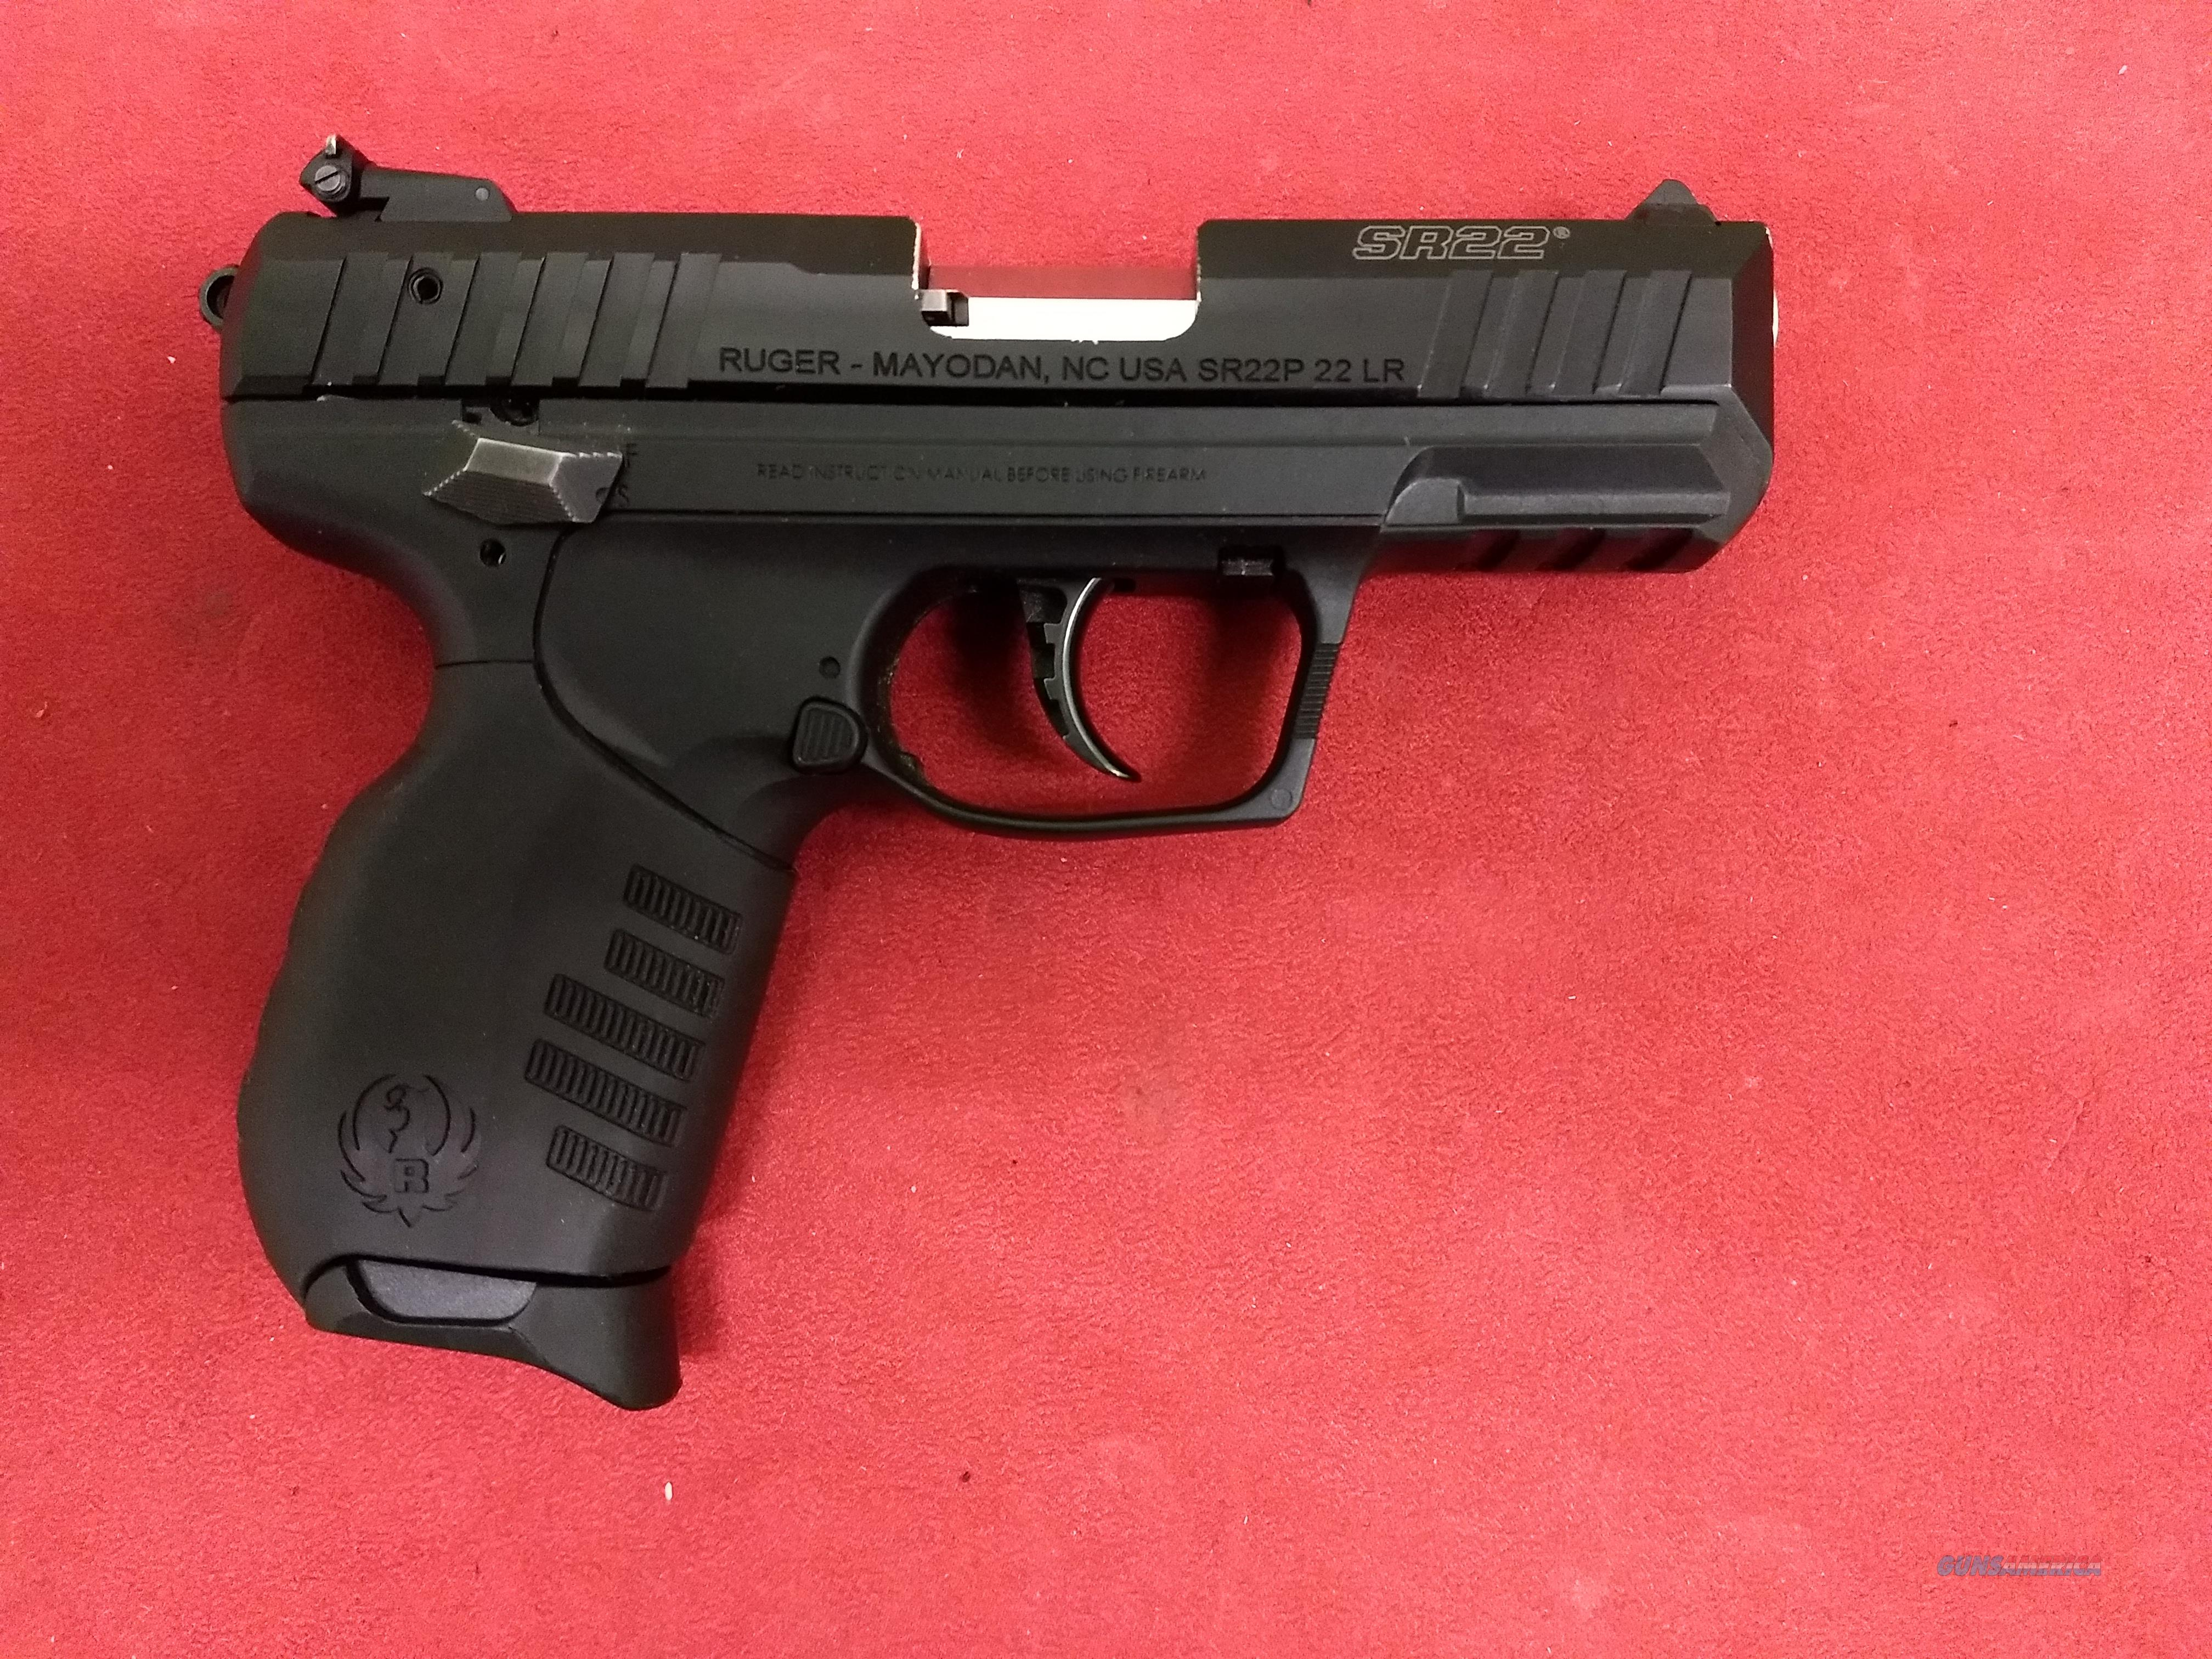 Ruger SR22, .22 LR, Like New!  Guns > Pistols > Ruger Semi-Auto Pistols > SR Family > SR22